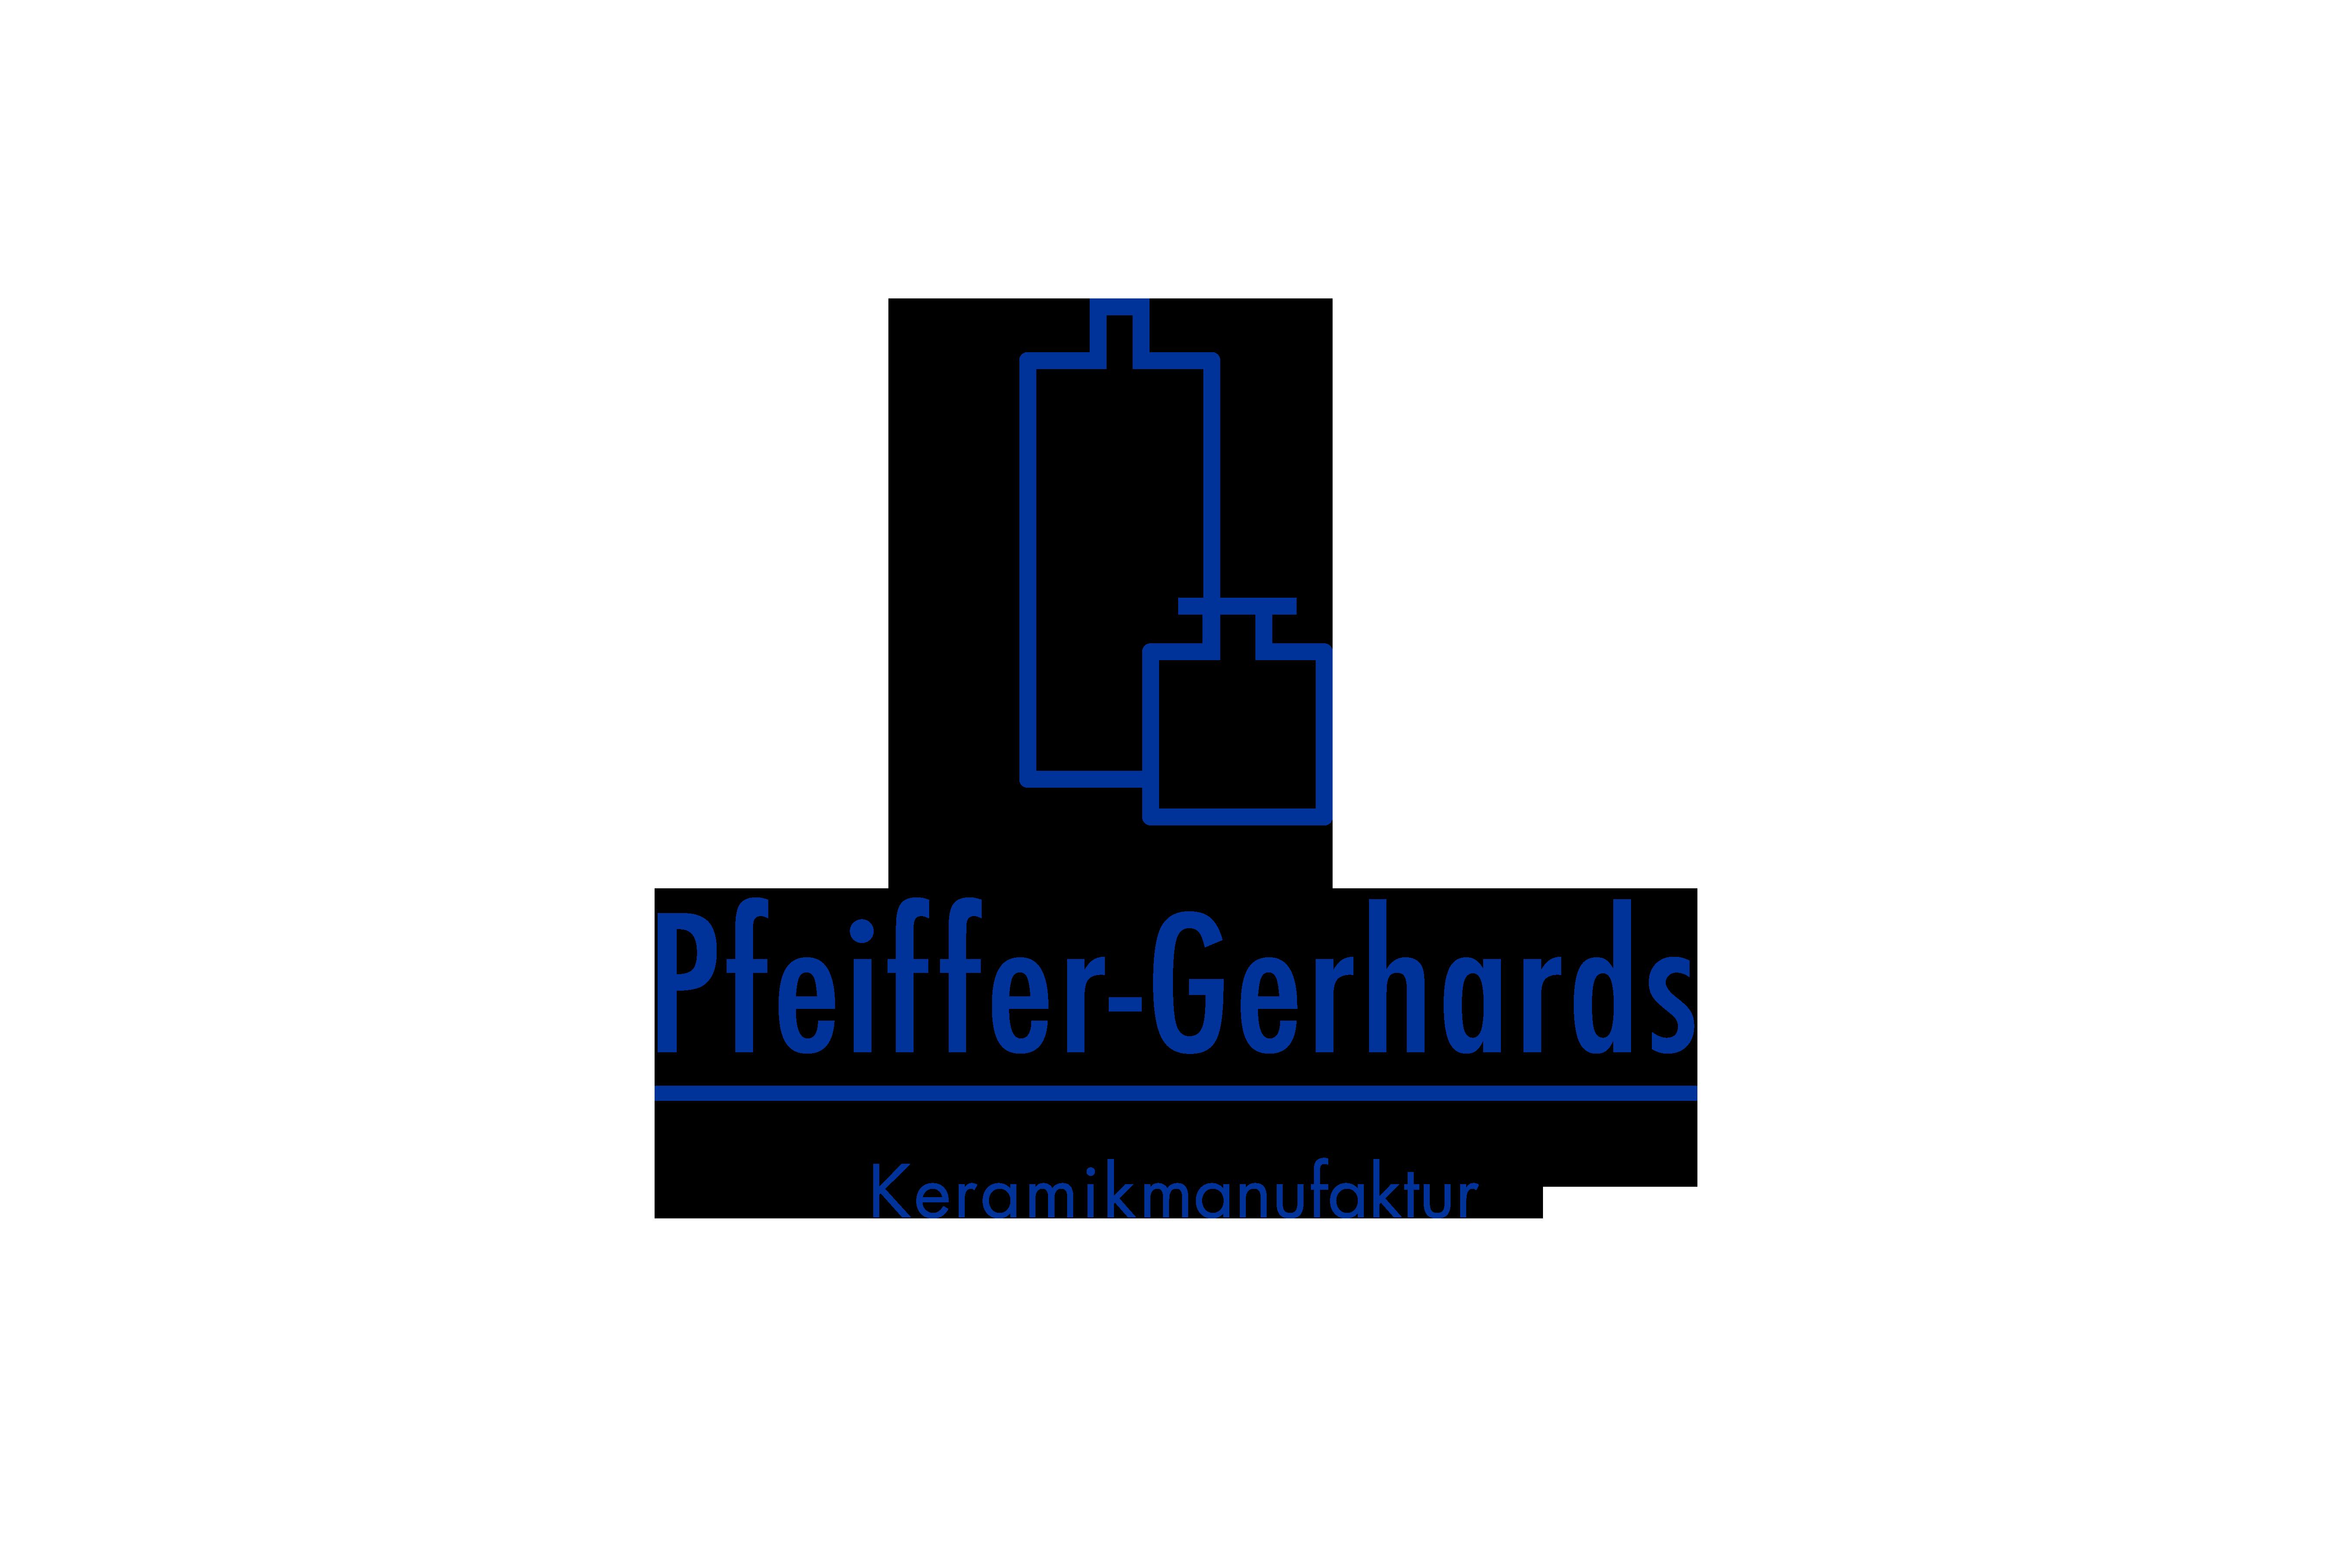 Pfeiffer Gerhards Logo Redesign